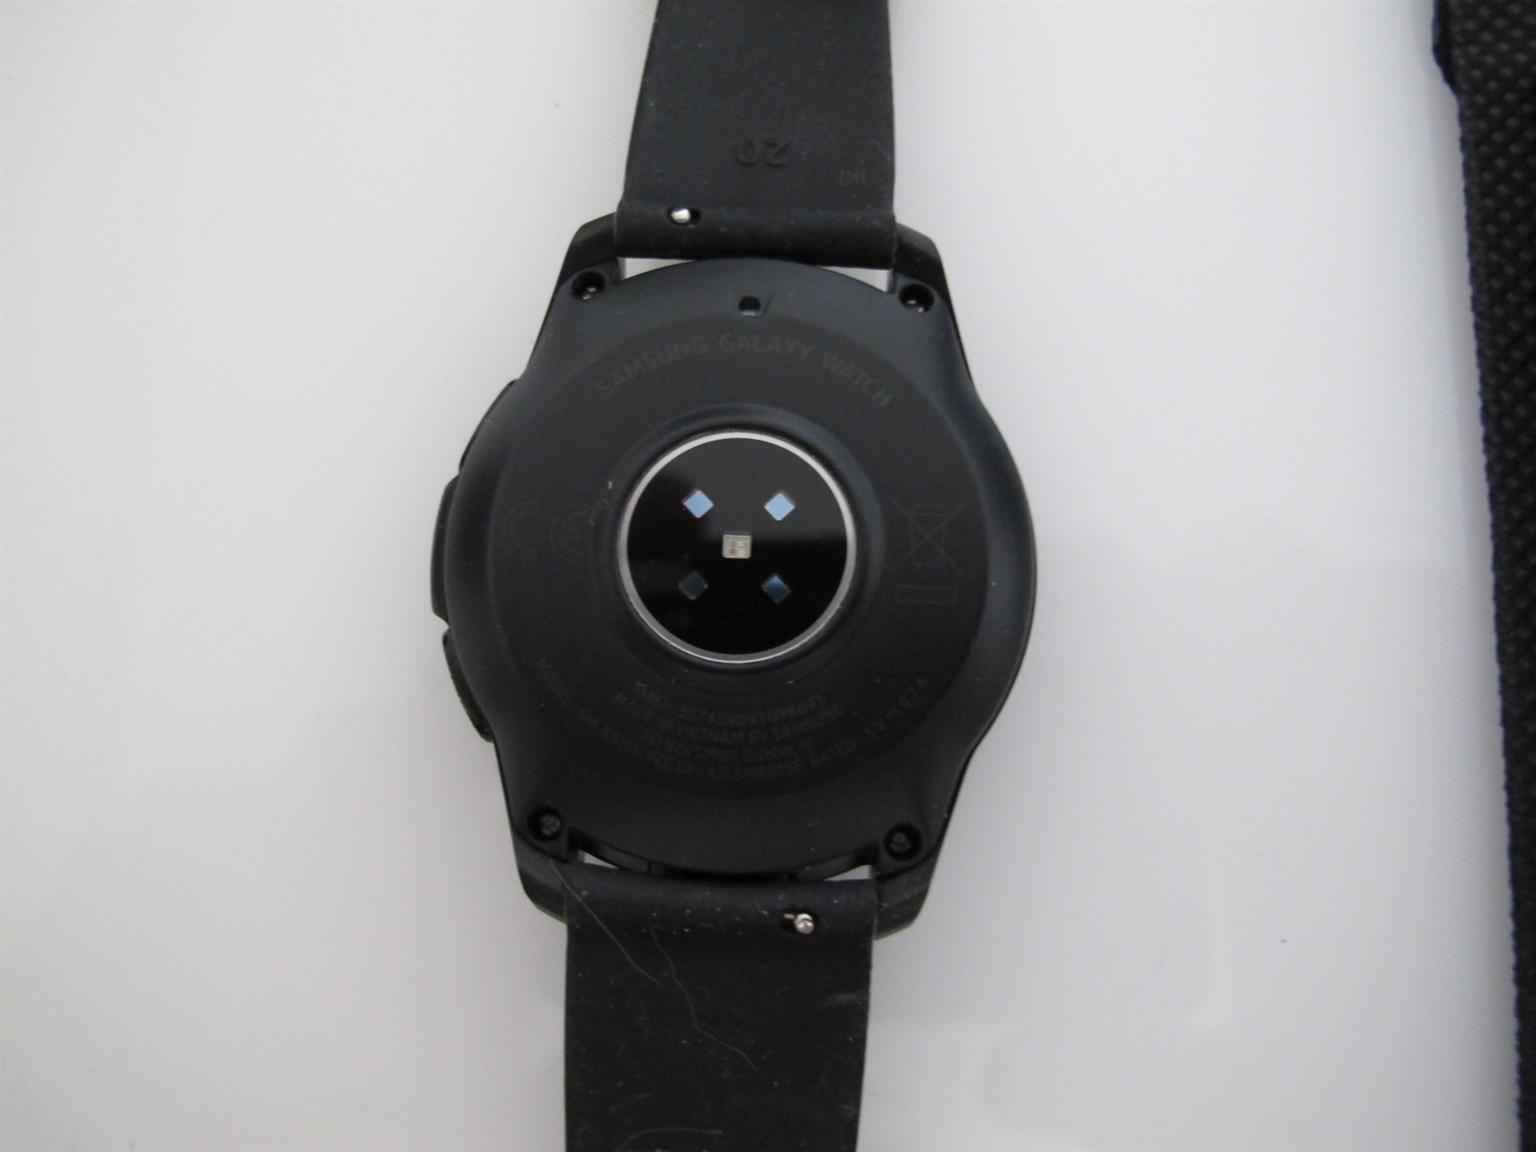 Samsung Galaxy Watch 42mm LTE/BT LIKE NEW Spotless